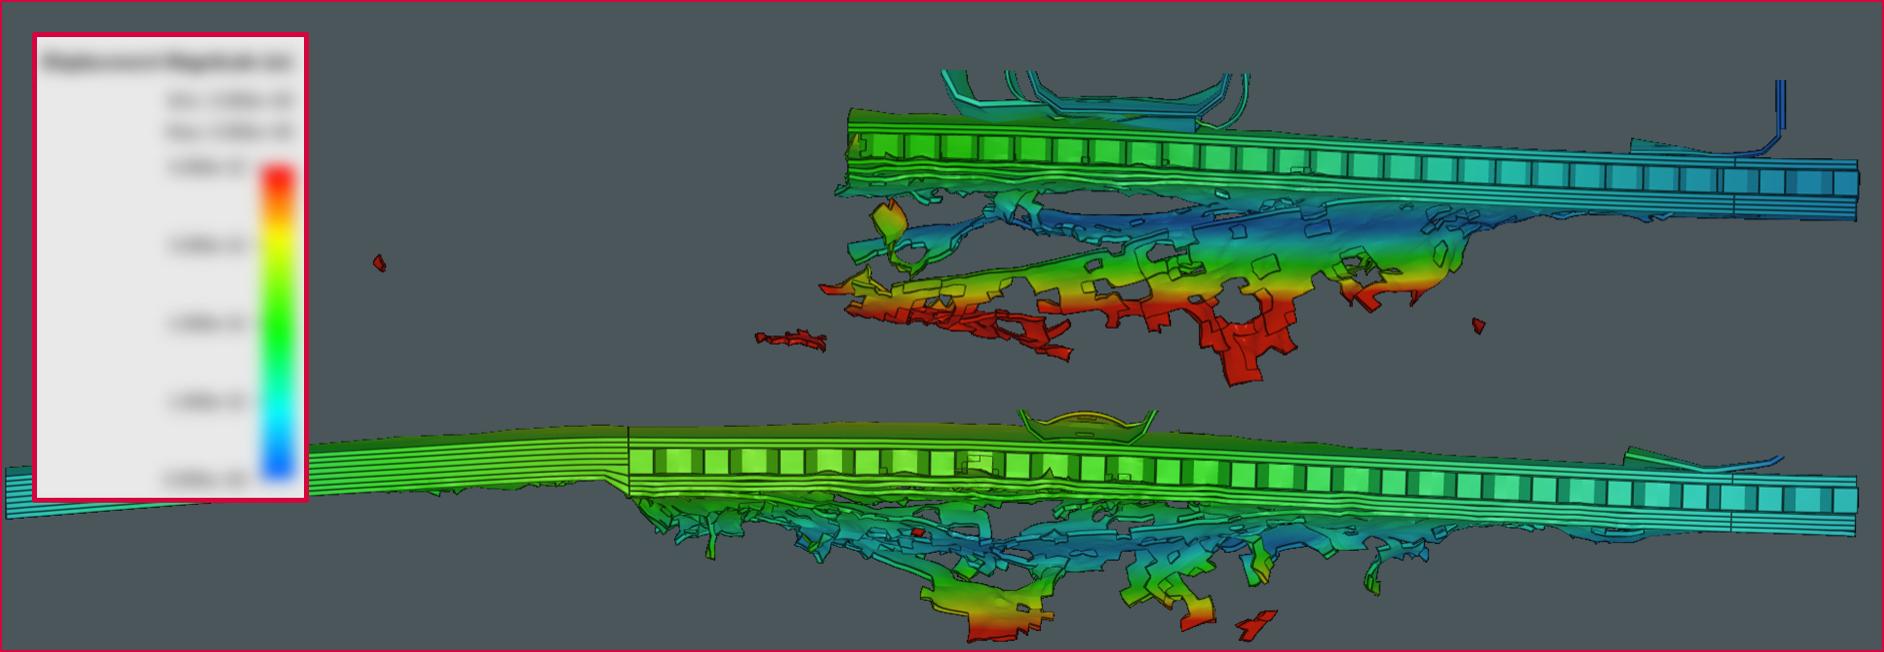 textbild-1-sprengsimulation